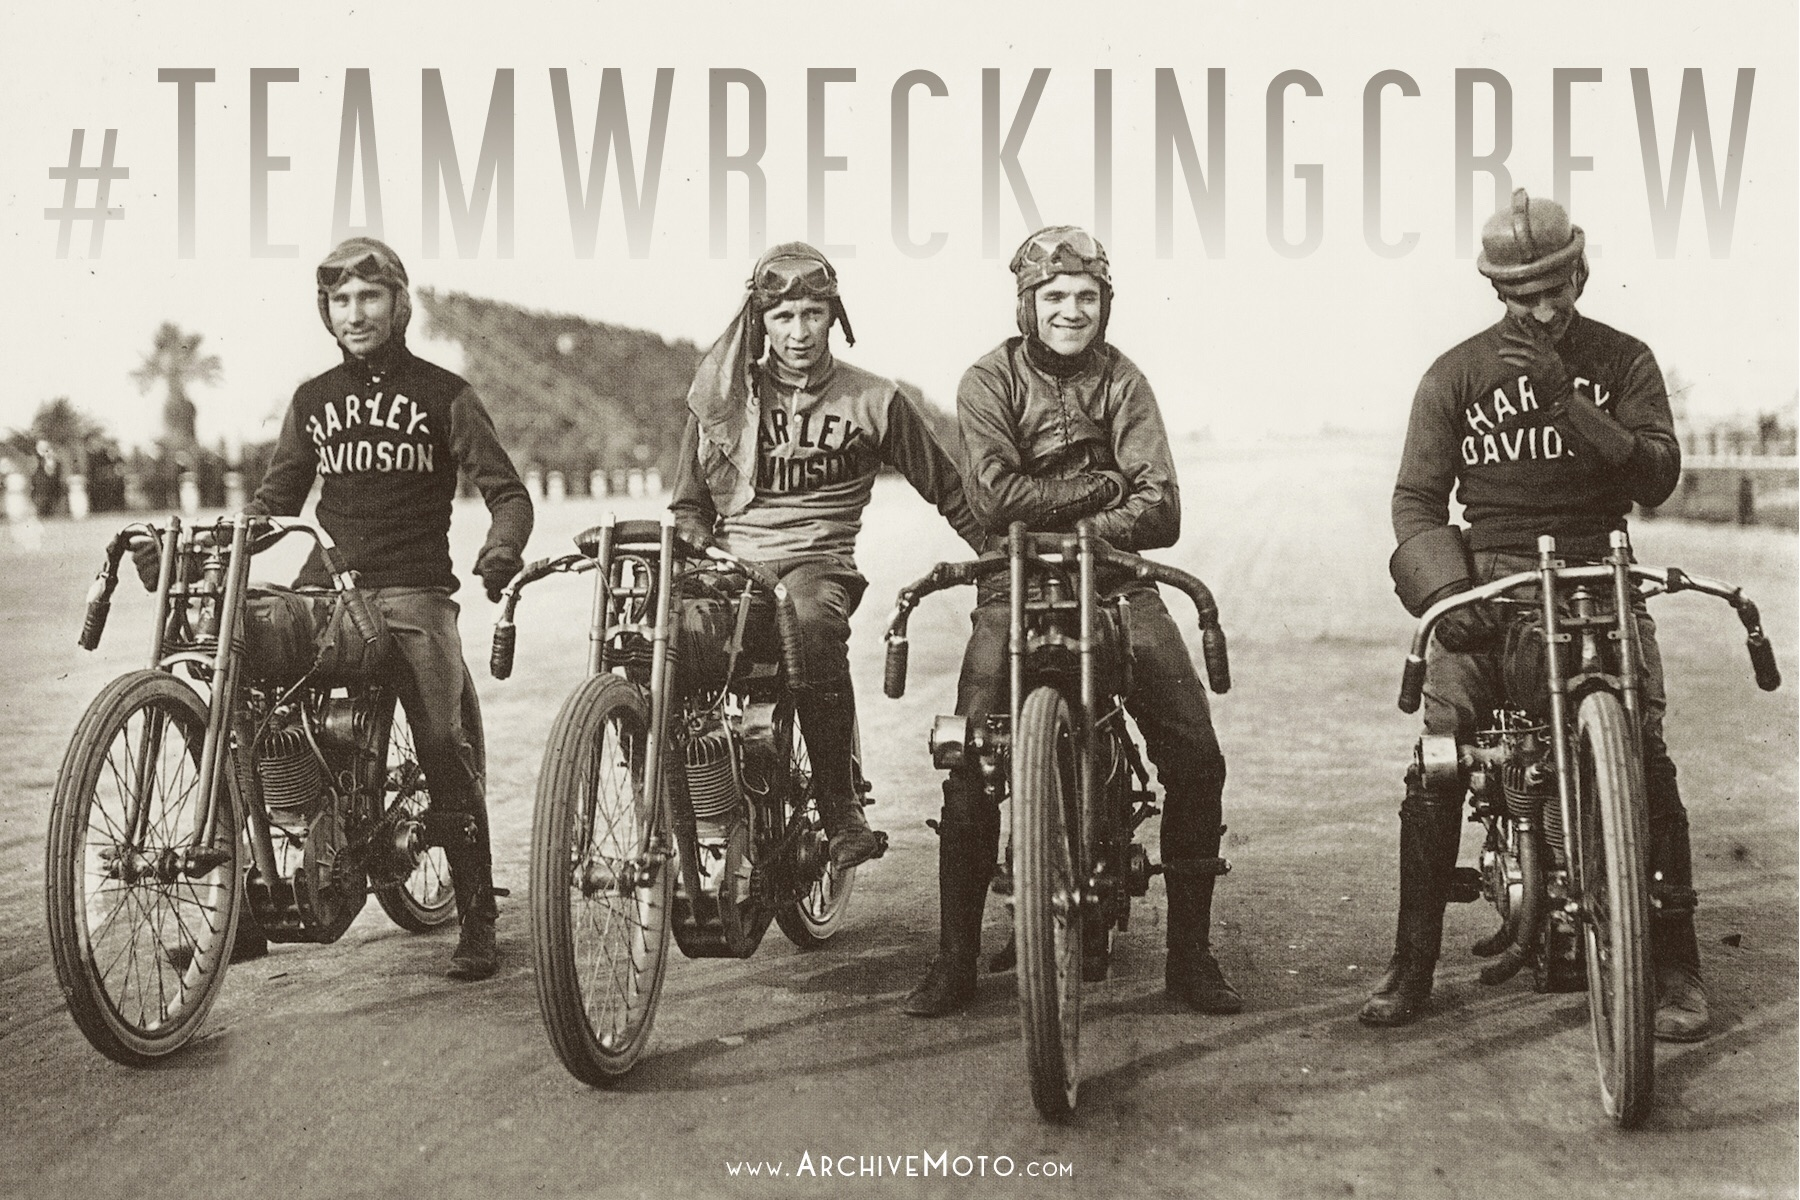 team wrecking crew archive moto. Black Bedroom Furniture Sets. Home Design Ideas